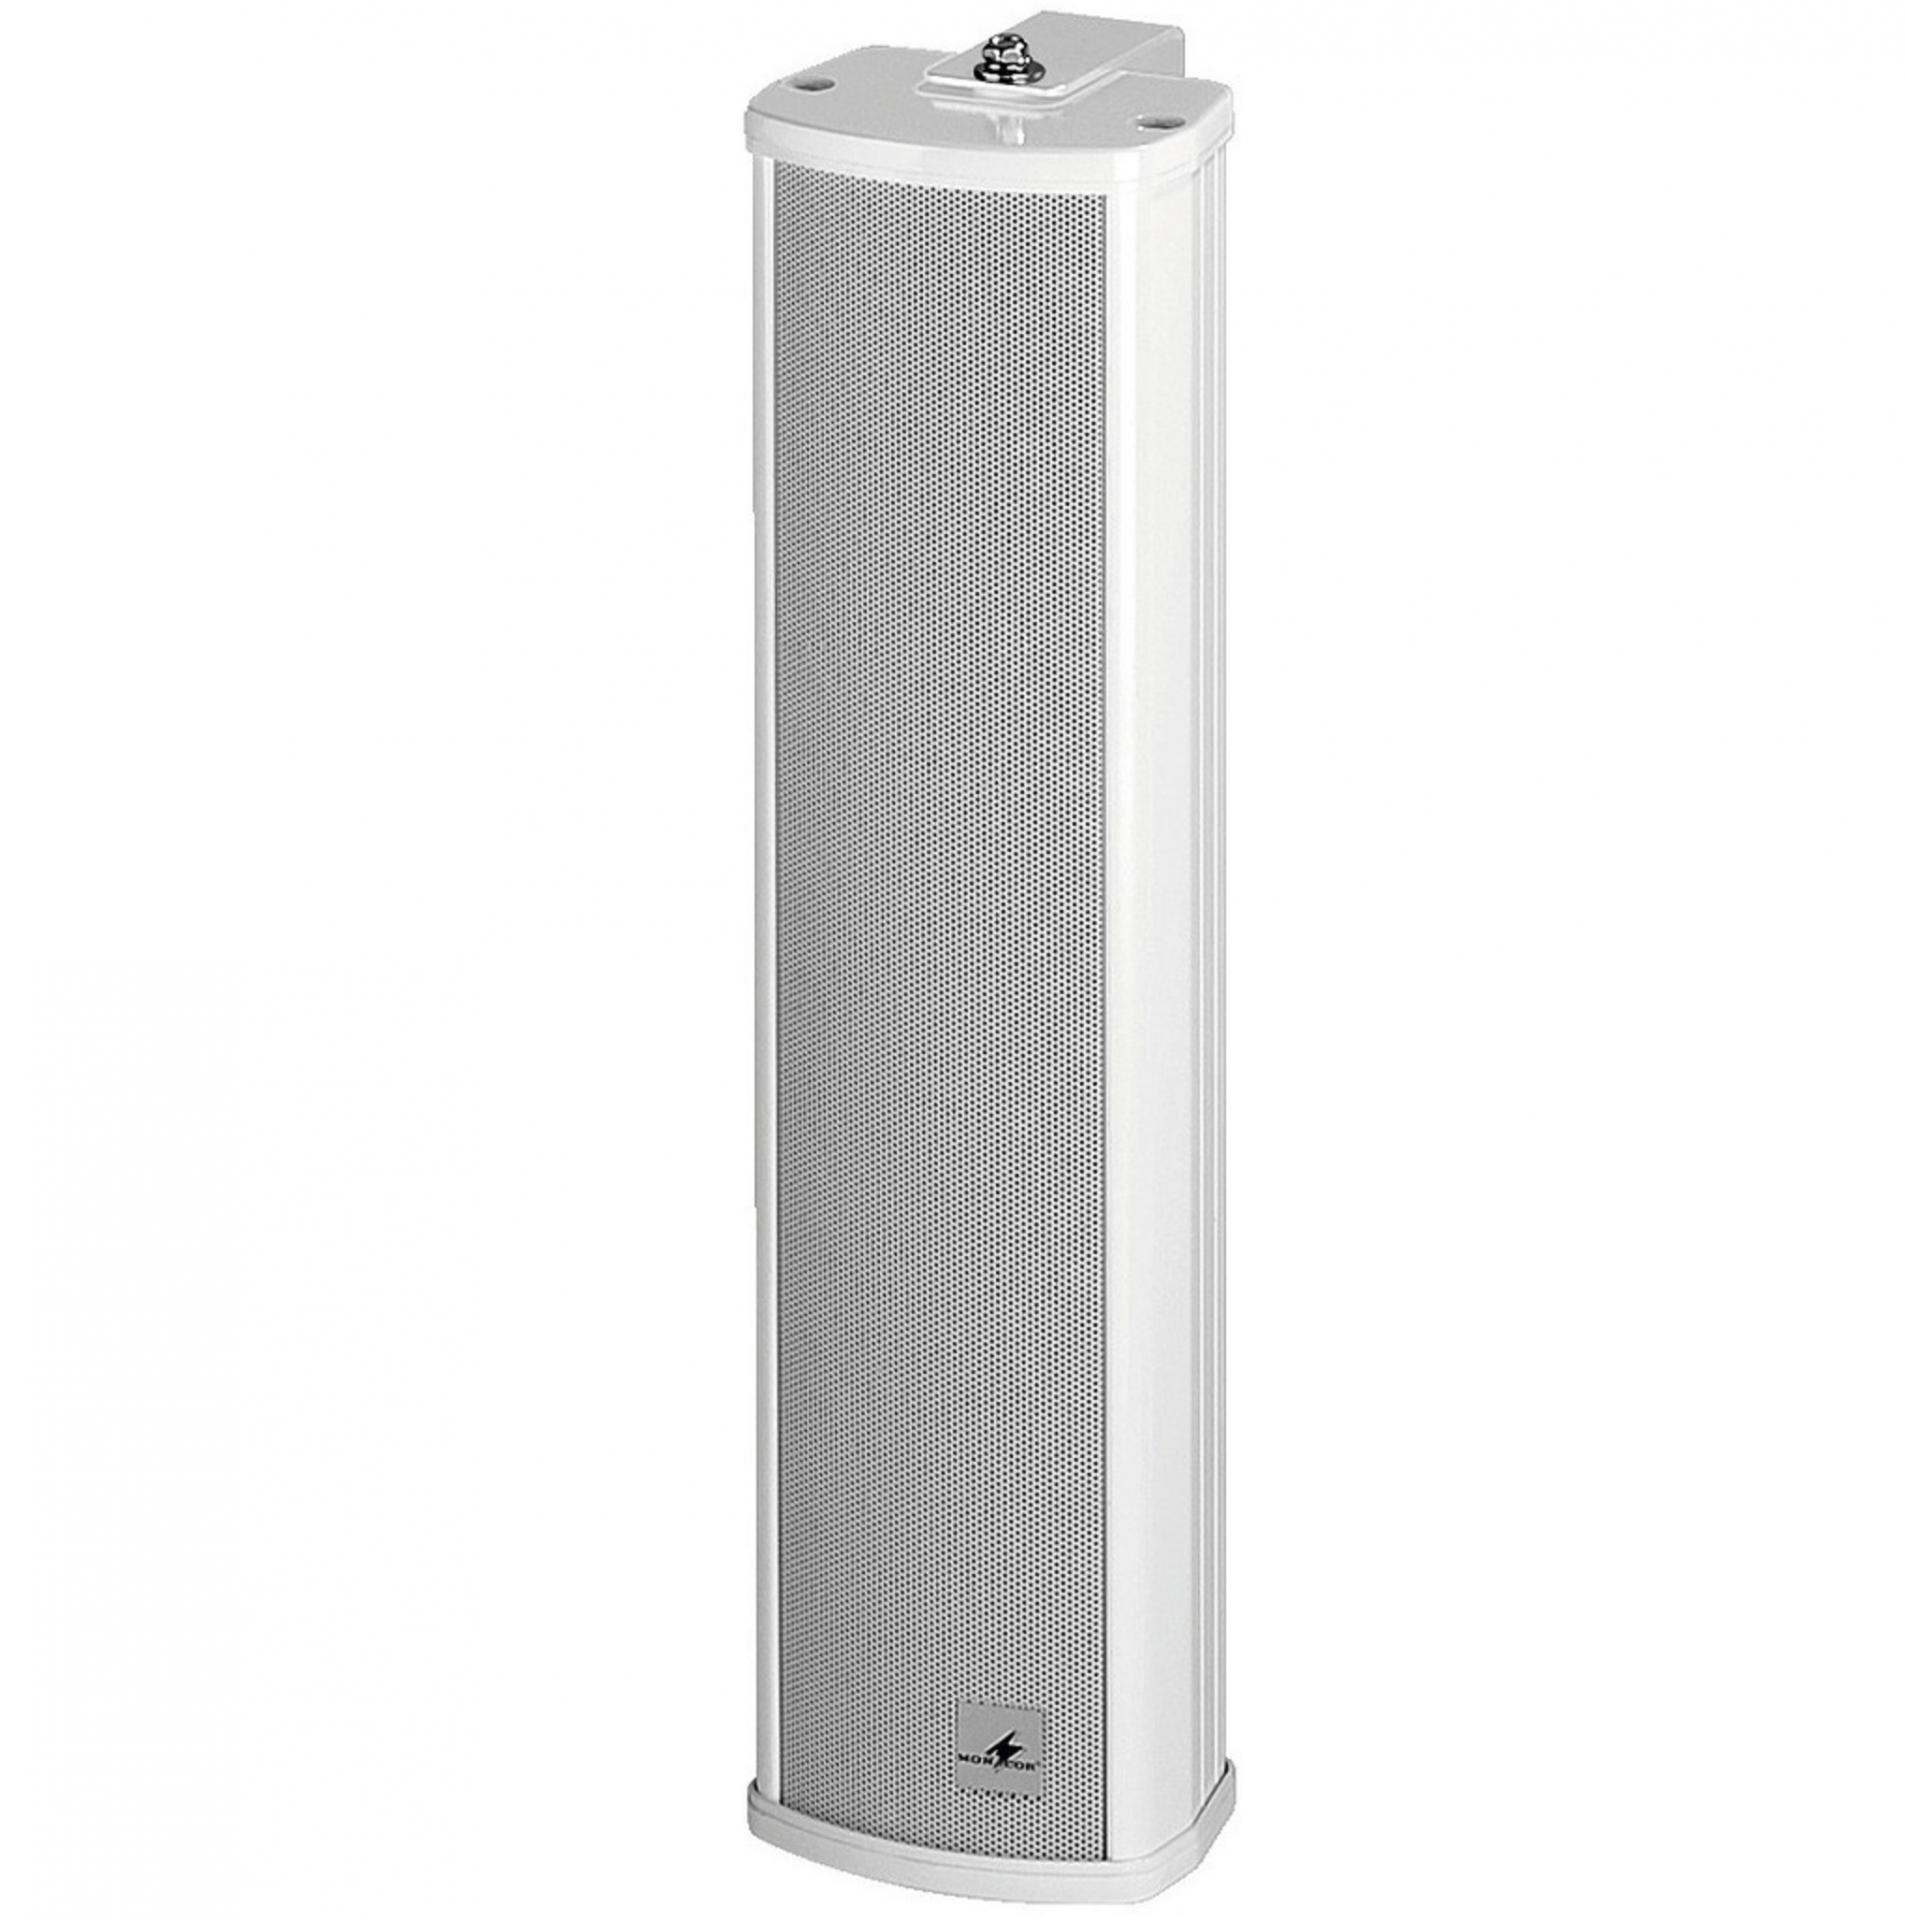 Monacor Ets-215/Ws Columna Acústica para Megafonía Línea 100V